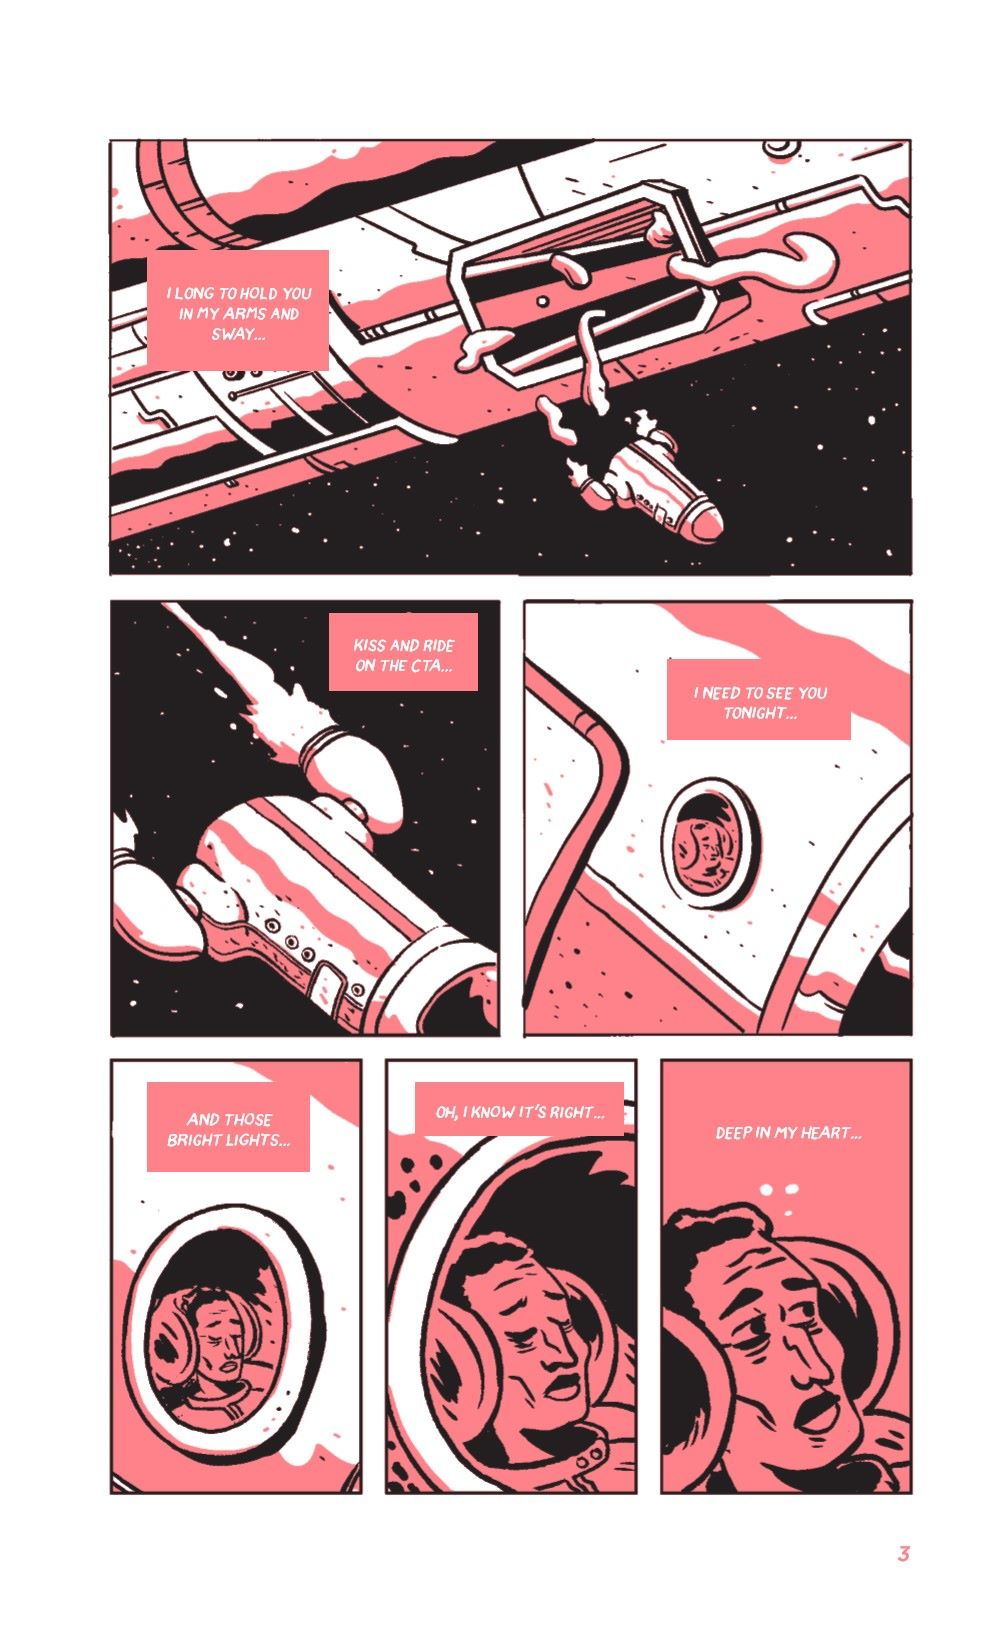 TITAN-REFERENCE-010 ComicList Previews: TITAN GN